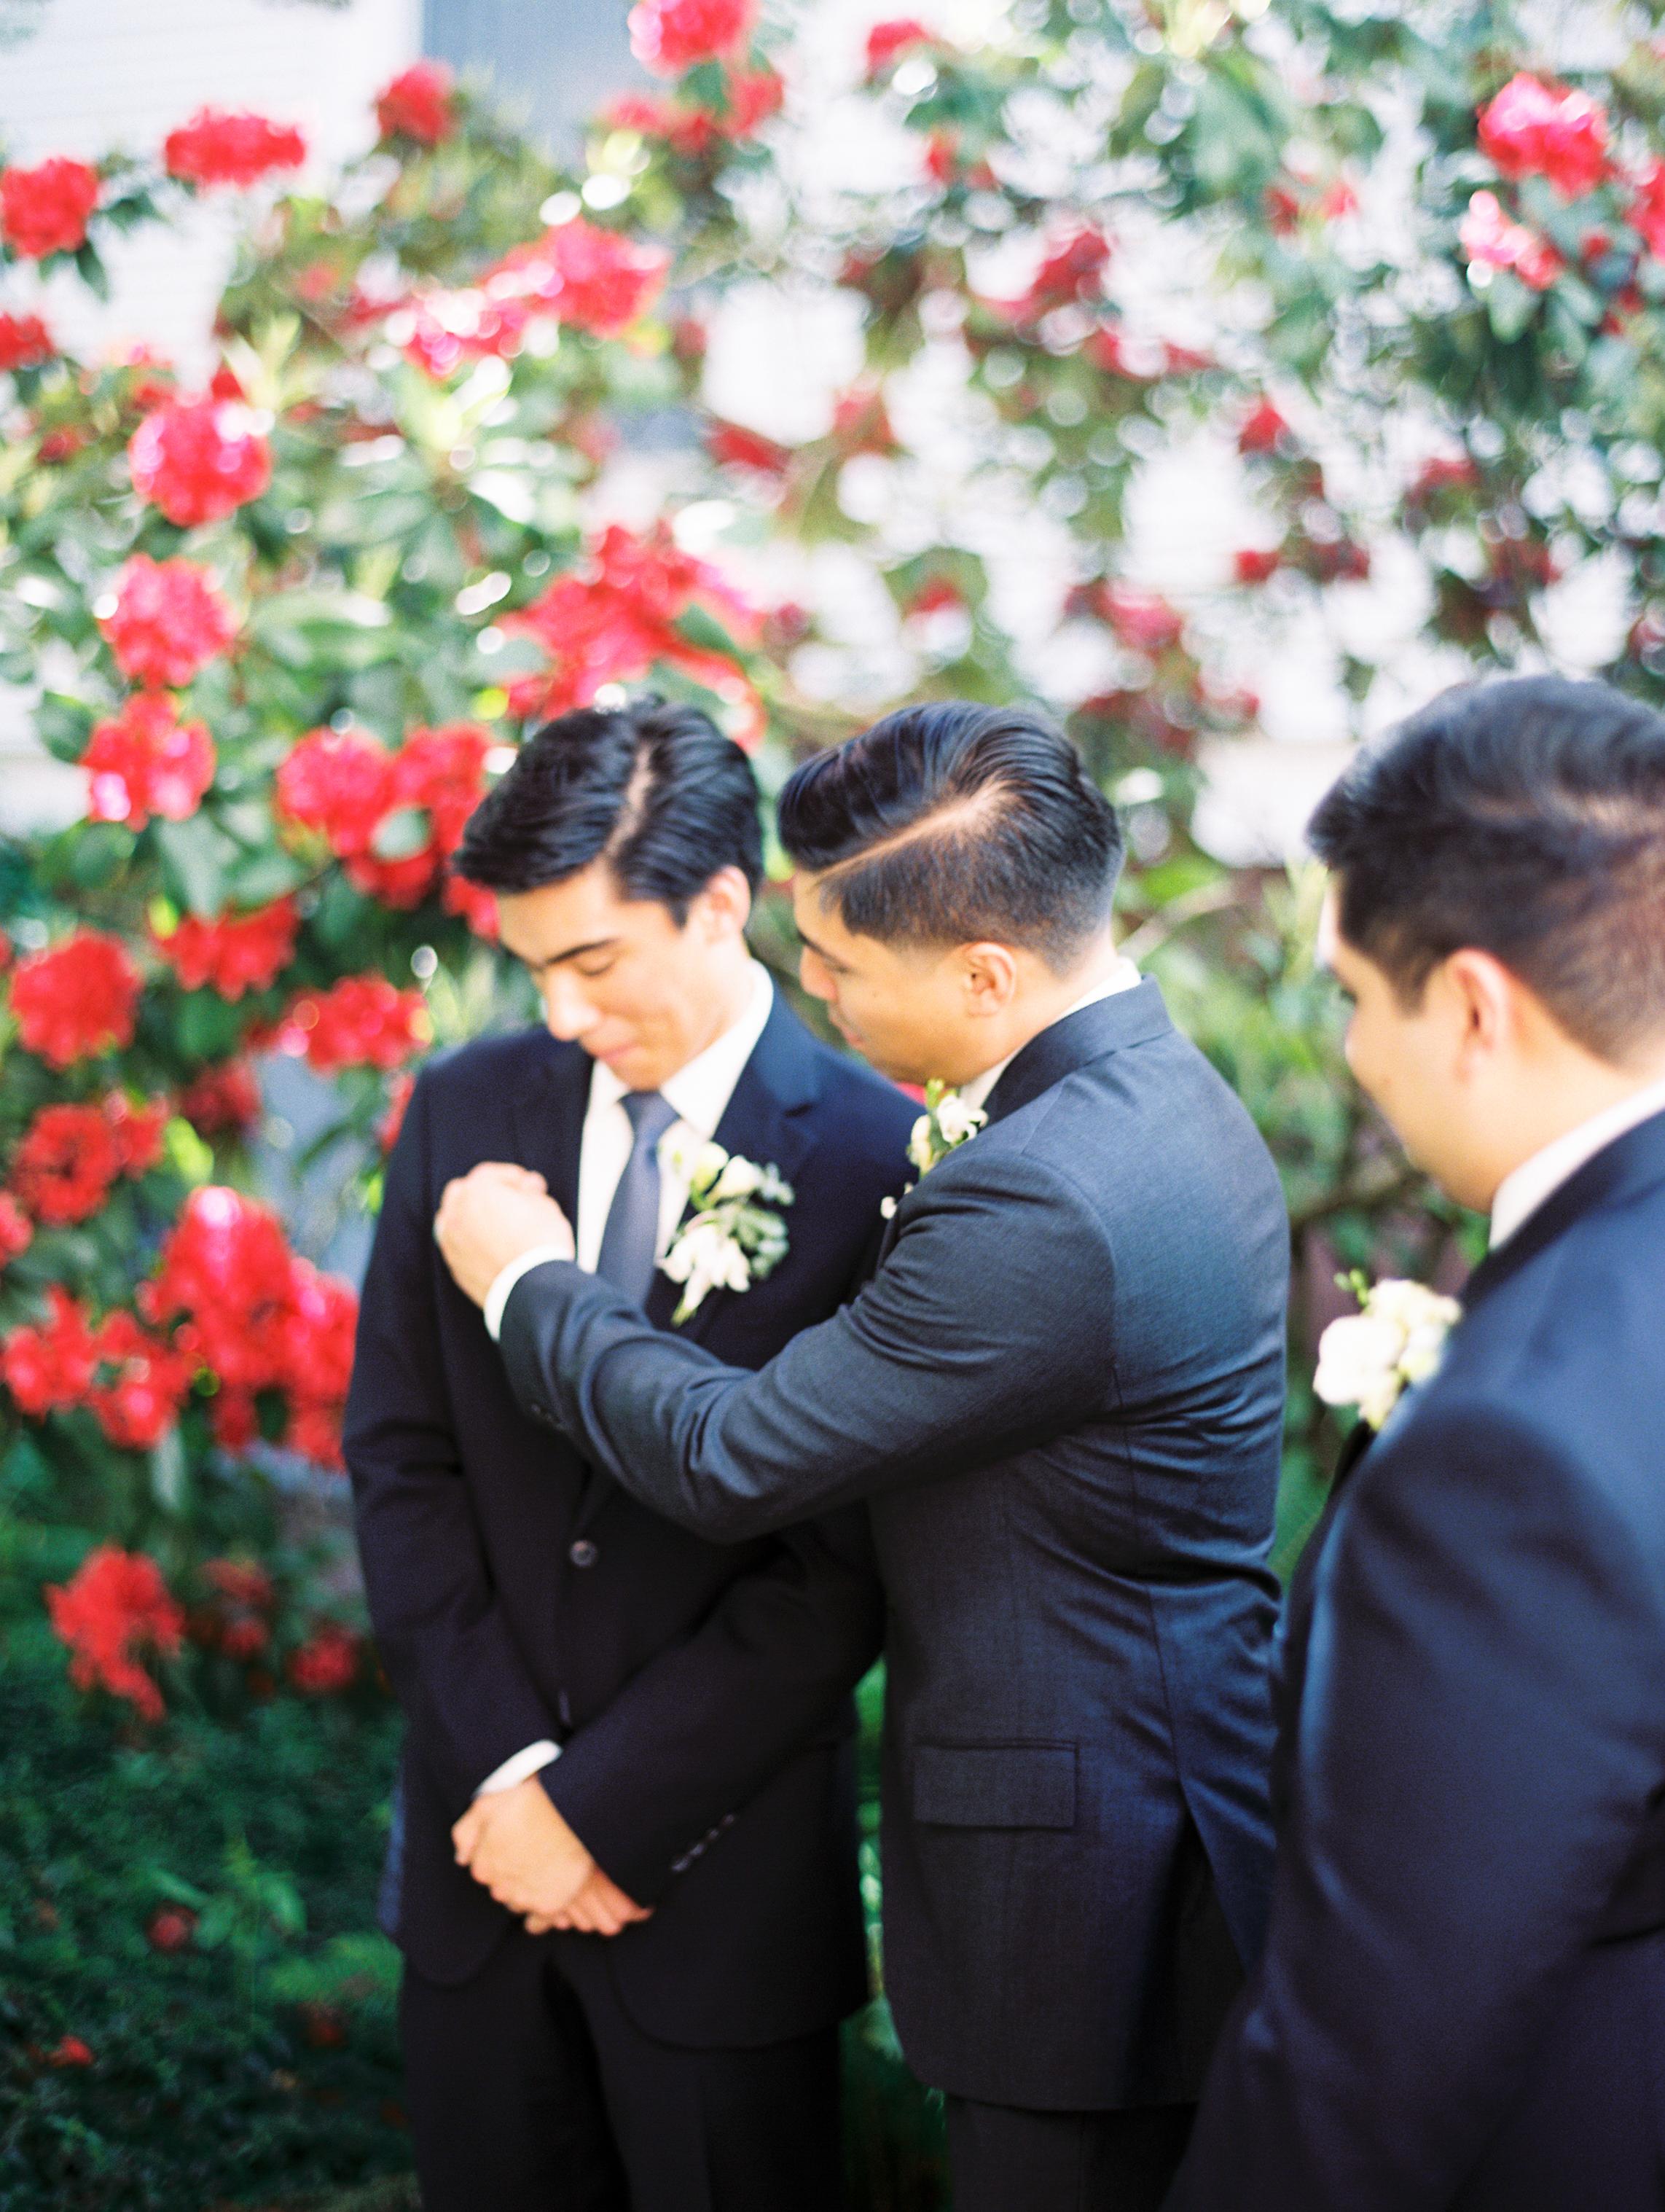 Idaho Wedding Photographer (54 of 128).jpg